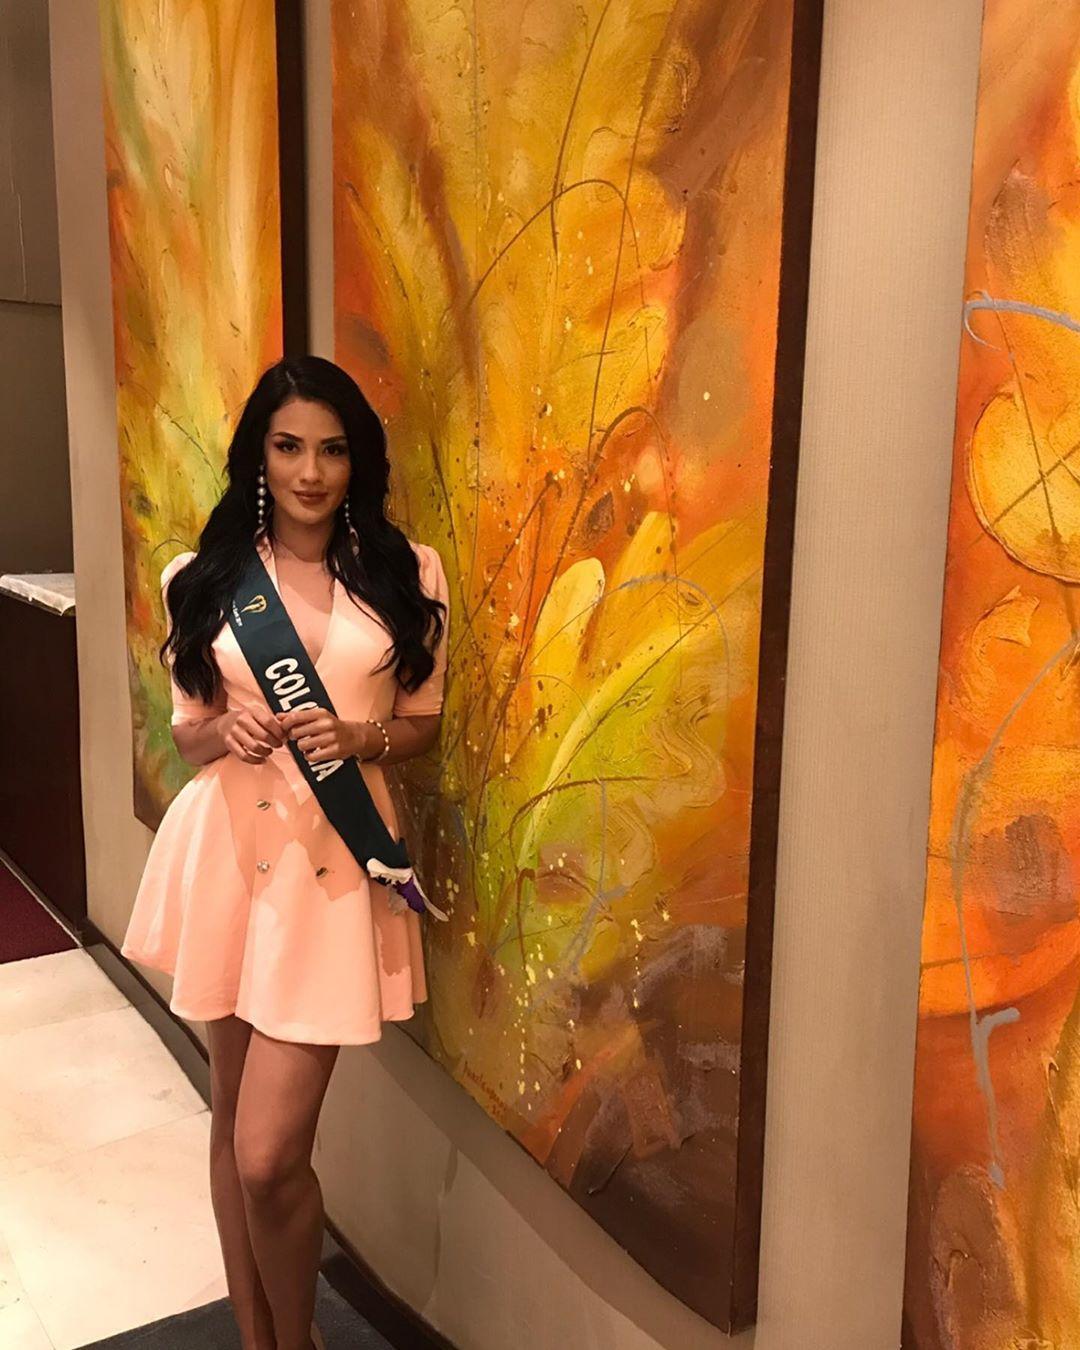 yenny katherine carrillo, top 20 de miss earth 2019/reyna mundial banano 2017. - Página 13 72233910